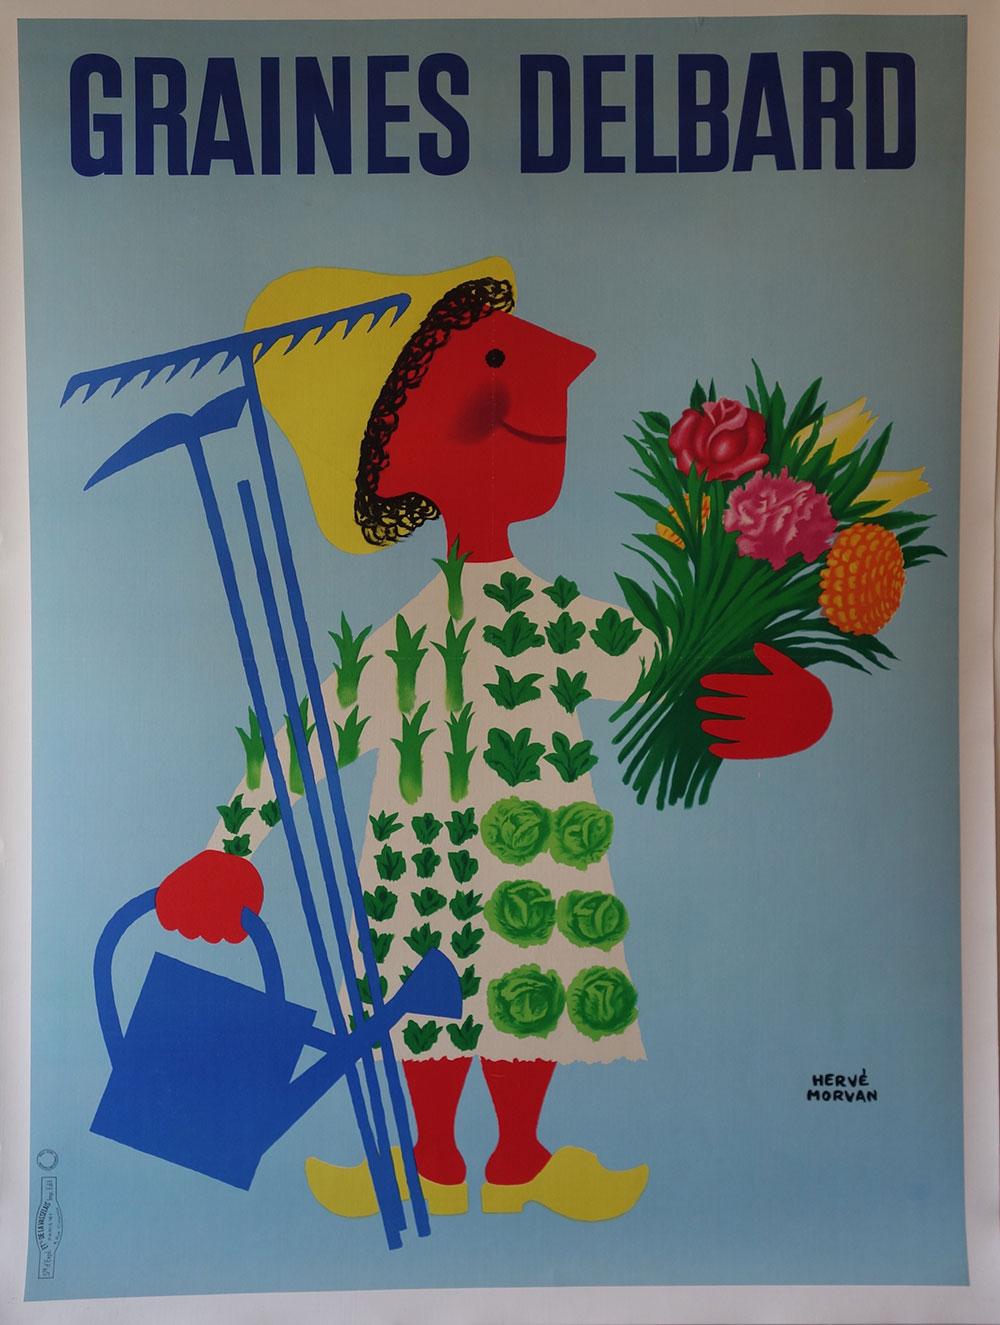 Graines Delbard Herve Morvan Vintage Edition Poster